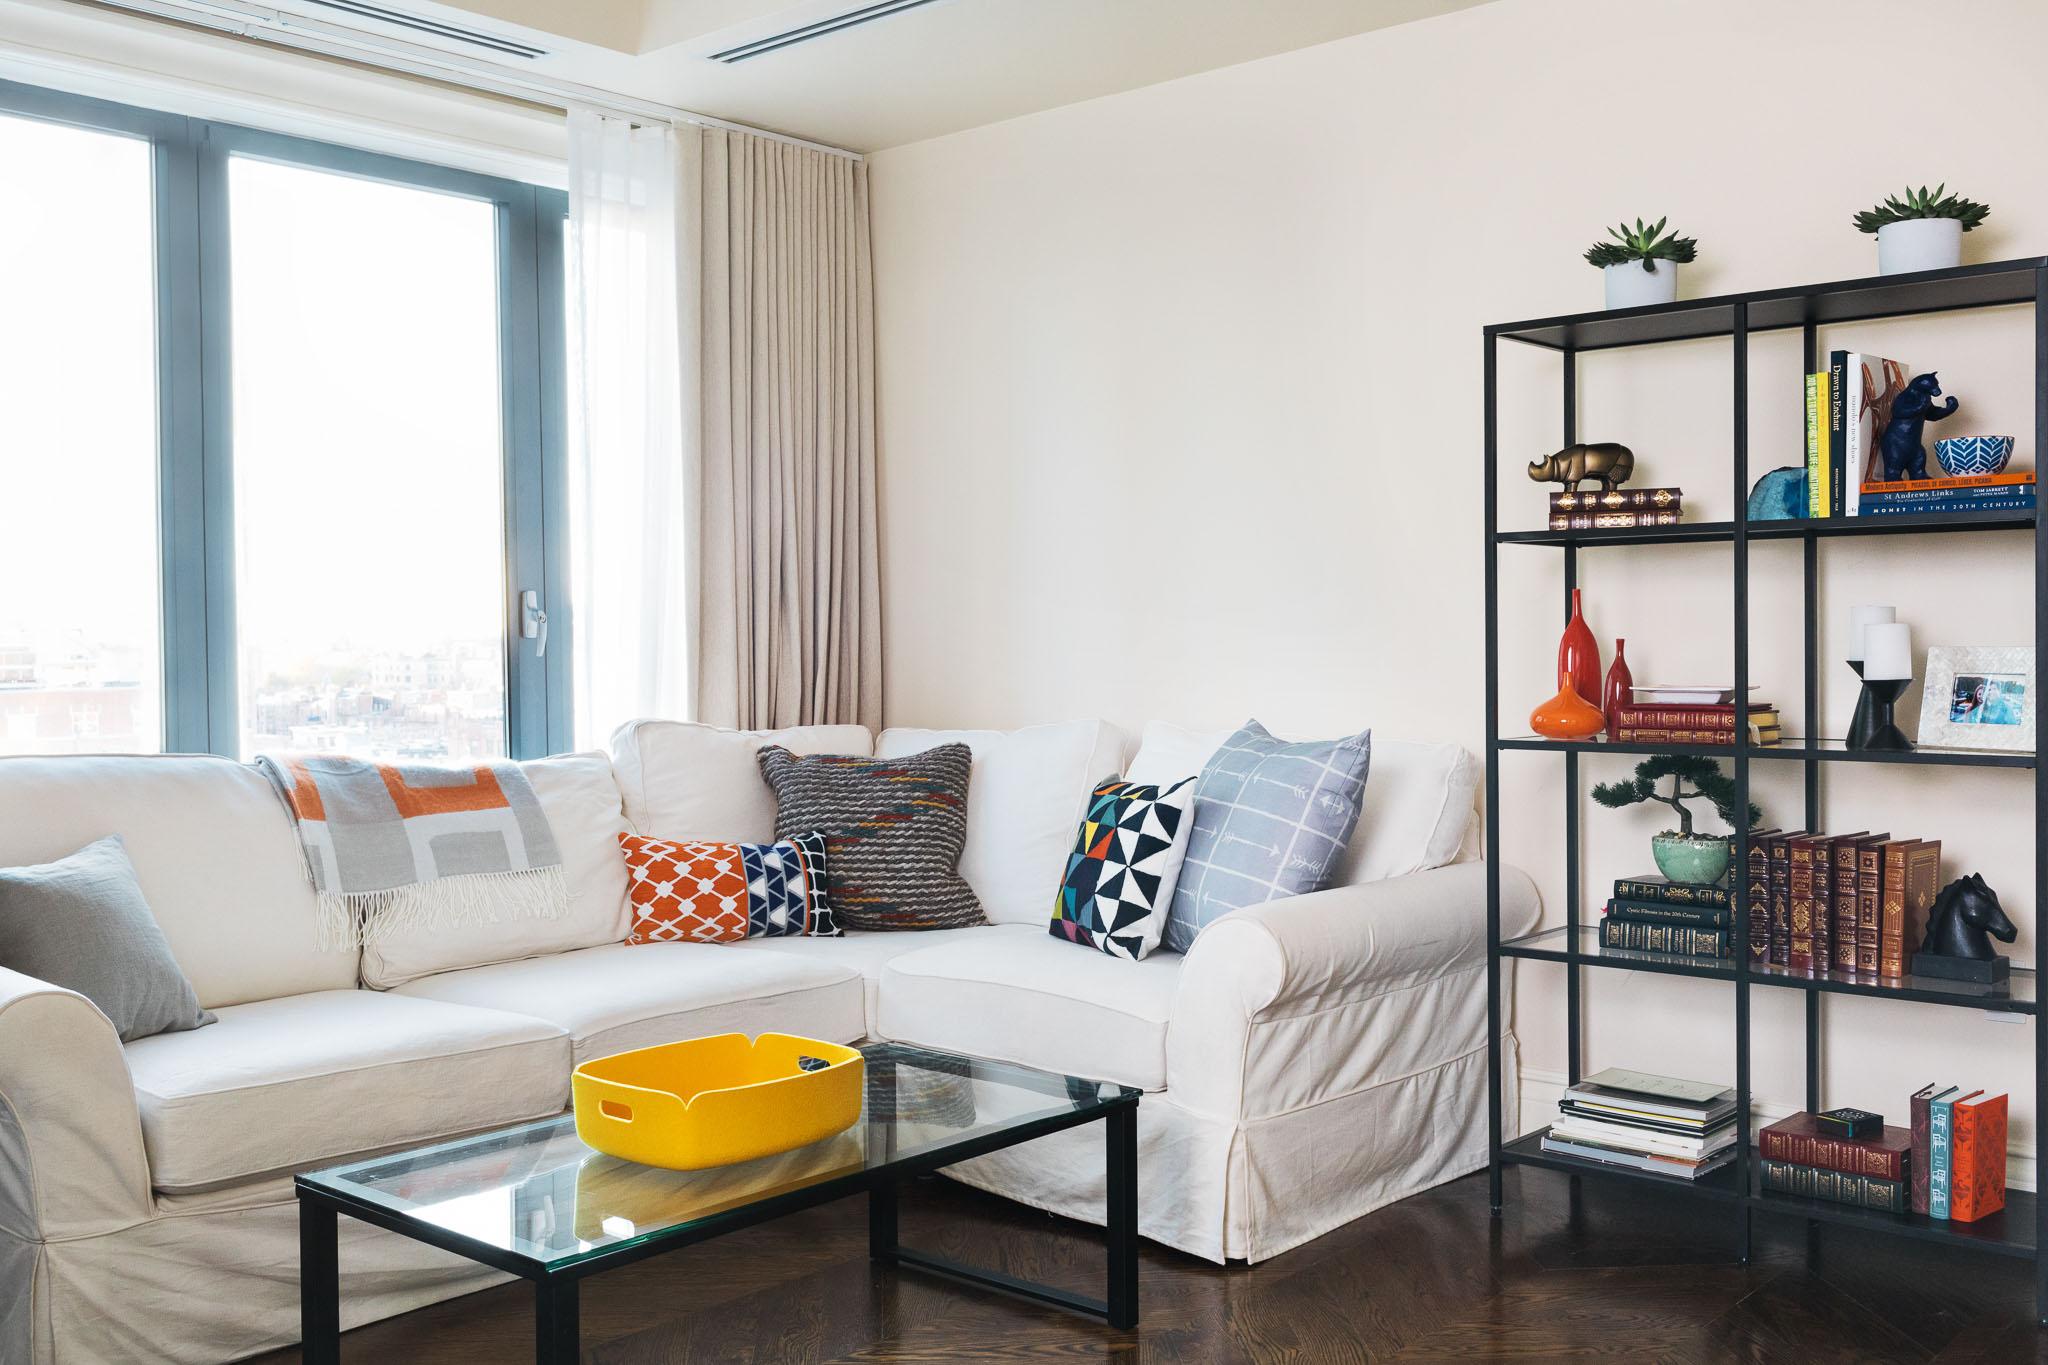 lounge-wide-casual-bookshelves.jpg